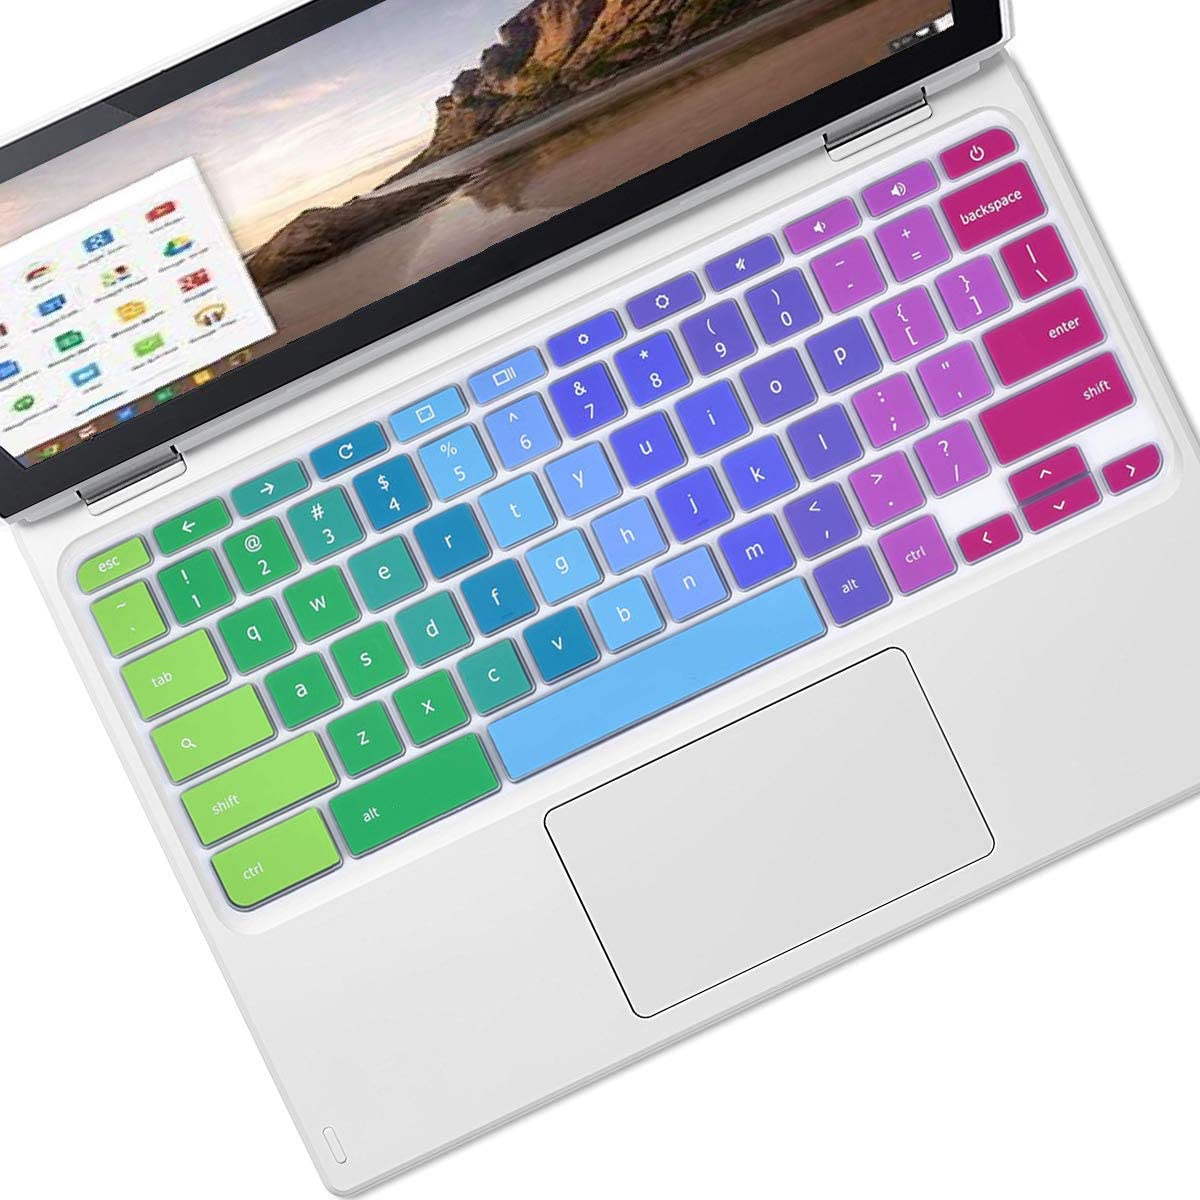 Keyboard Cover for HP Chromebook 11 11.6 Inch 11a-nb0013dx 11a-nb0047nr | HP Chromebook x360 11.6